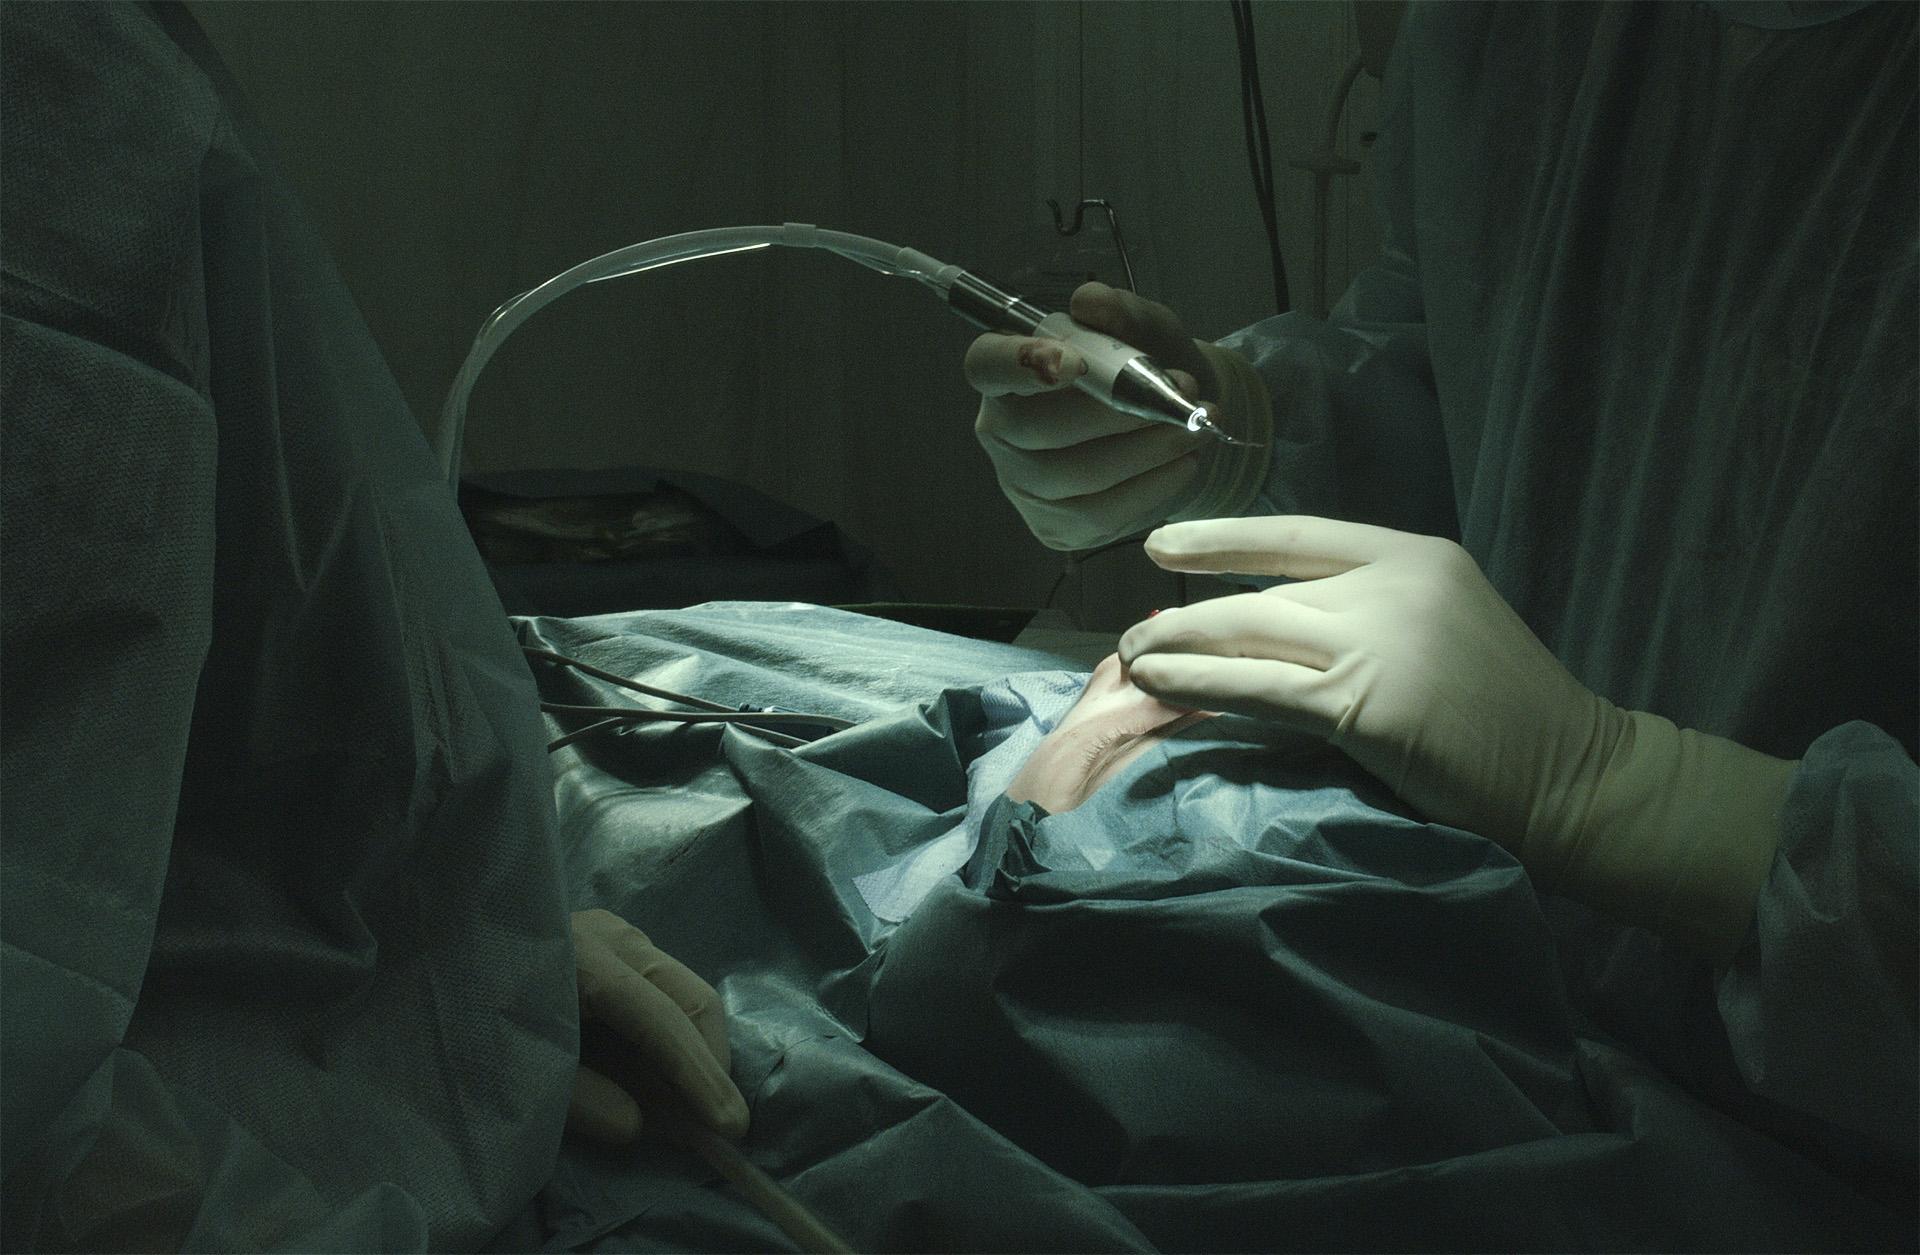 Пьезо-аппарат в ринопластике. Преимущества пьезохирургии